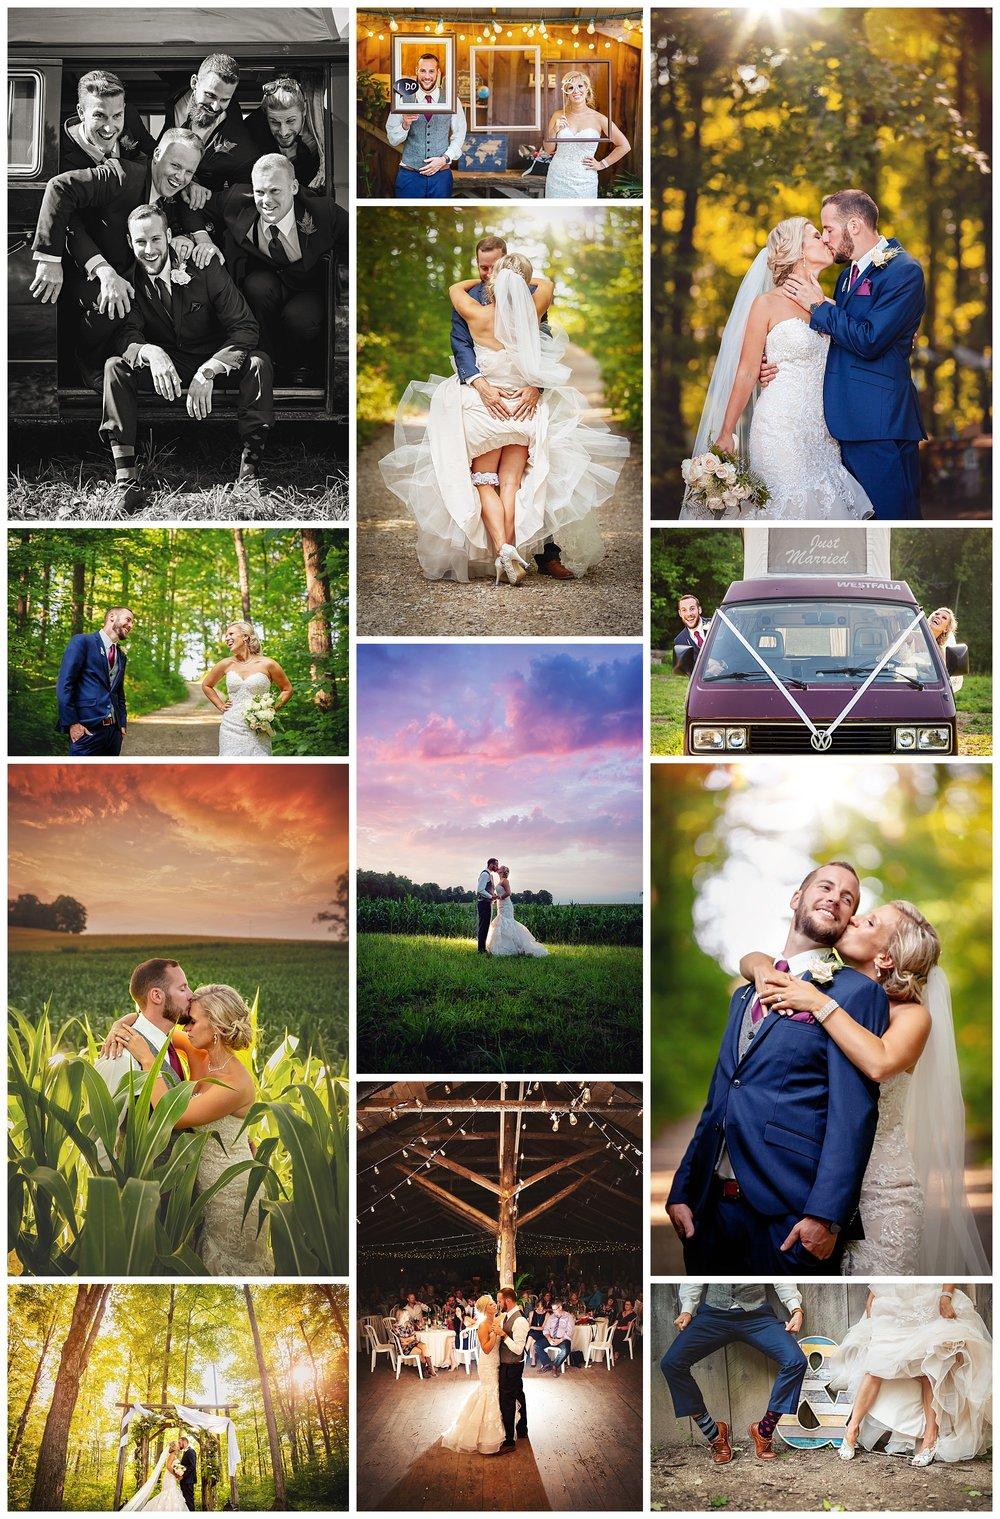 Love's Sugar Bush, Holstein Ontario wedding photos by VanDaele & Russell